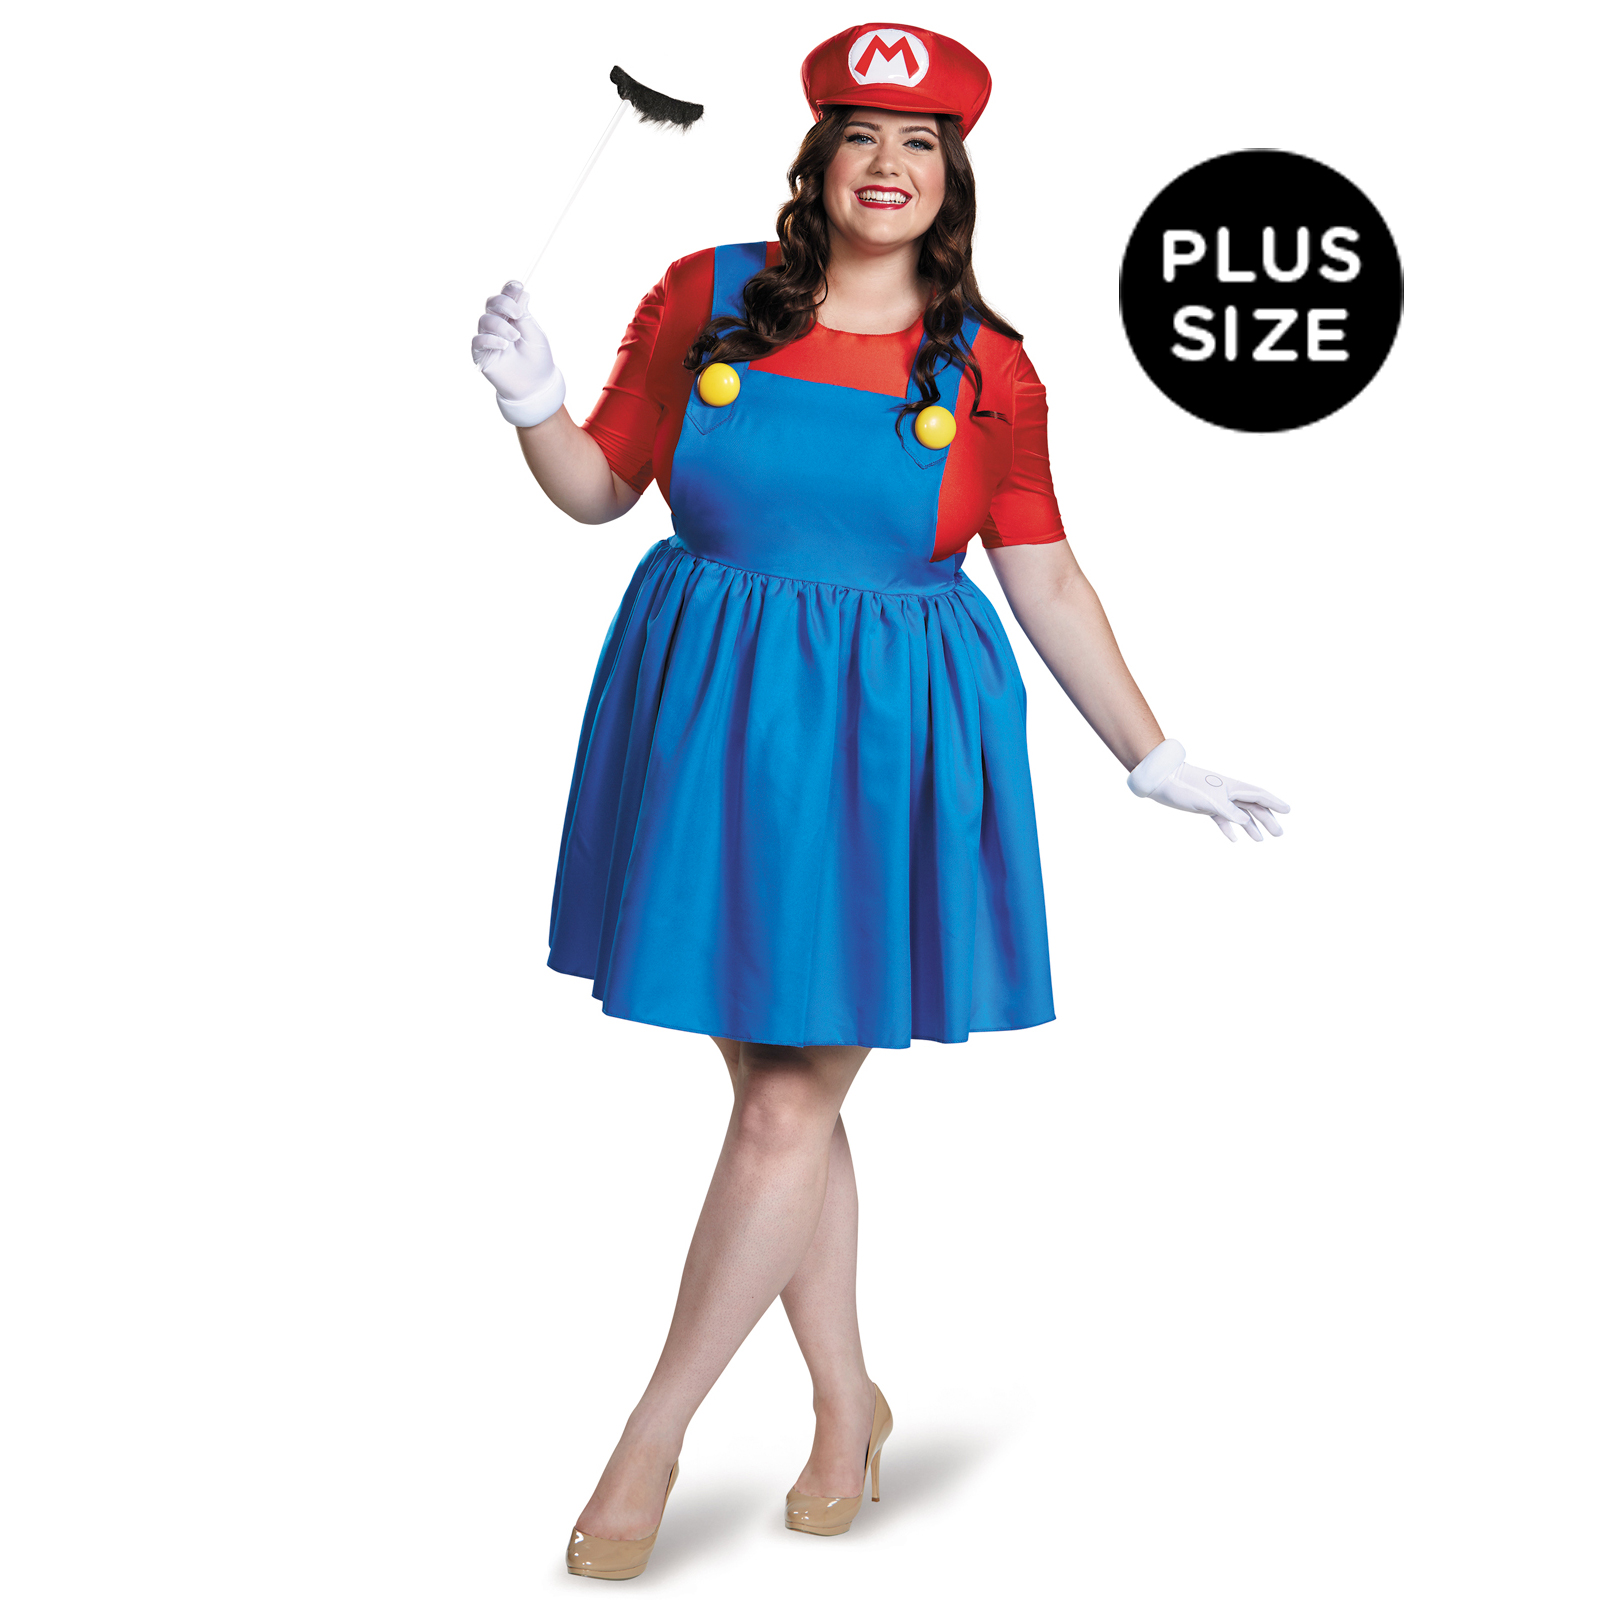 super mario plus size mario costume wskirt for women